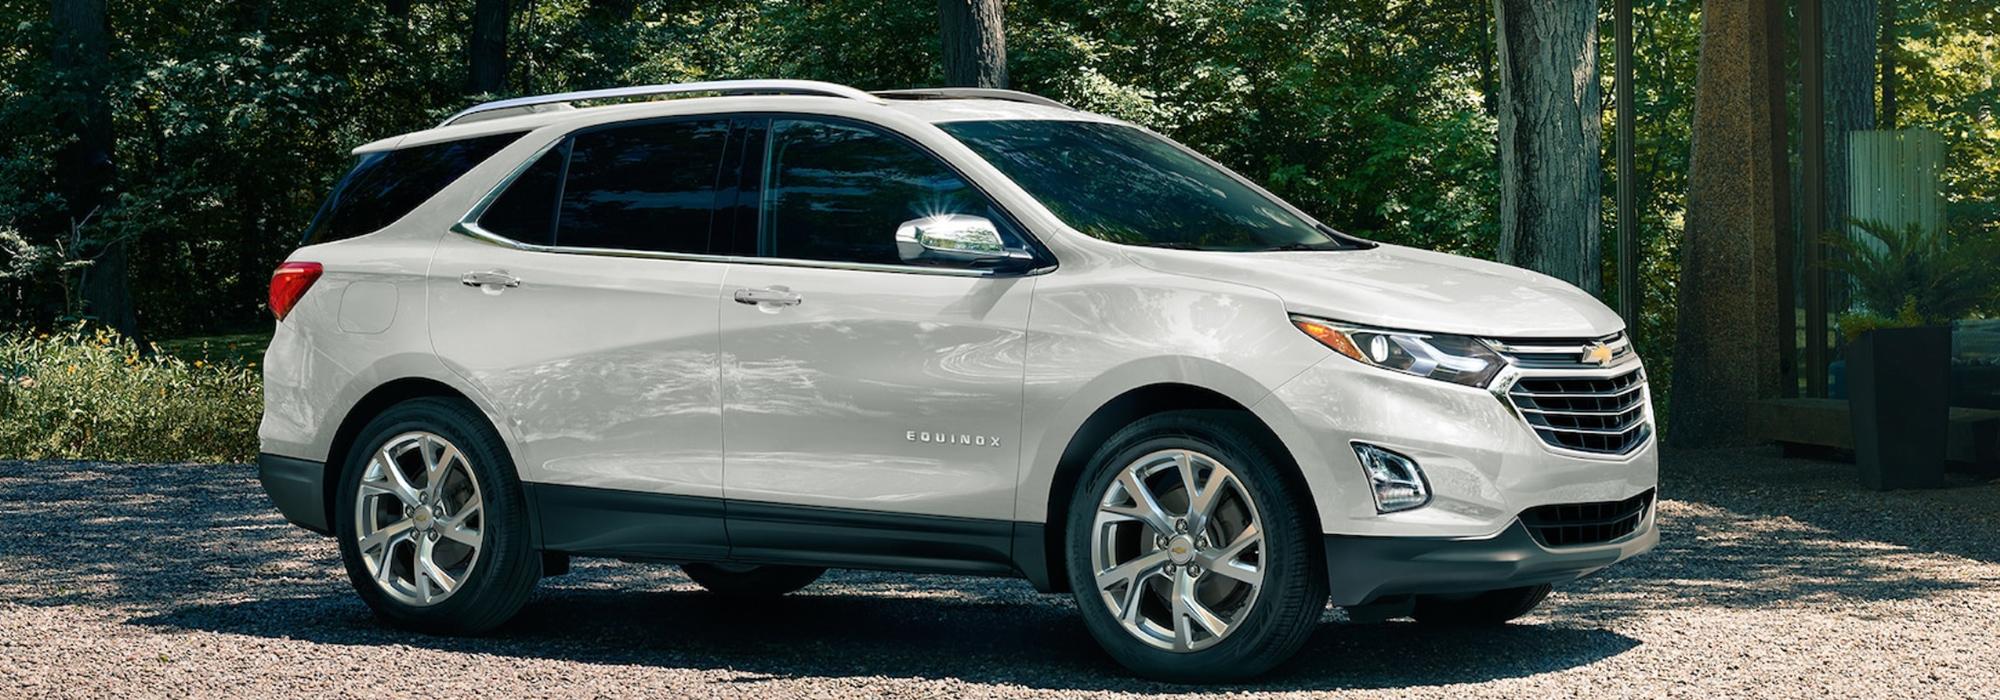 2019 Chevrolet Equinox Aberdeen Chevrolet My Chevy Dealer